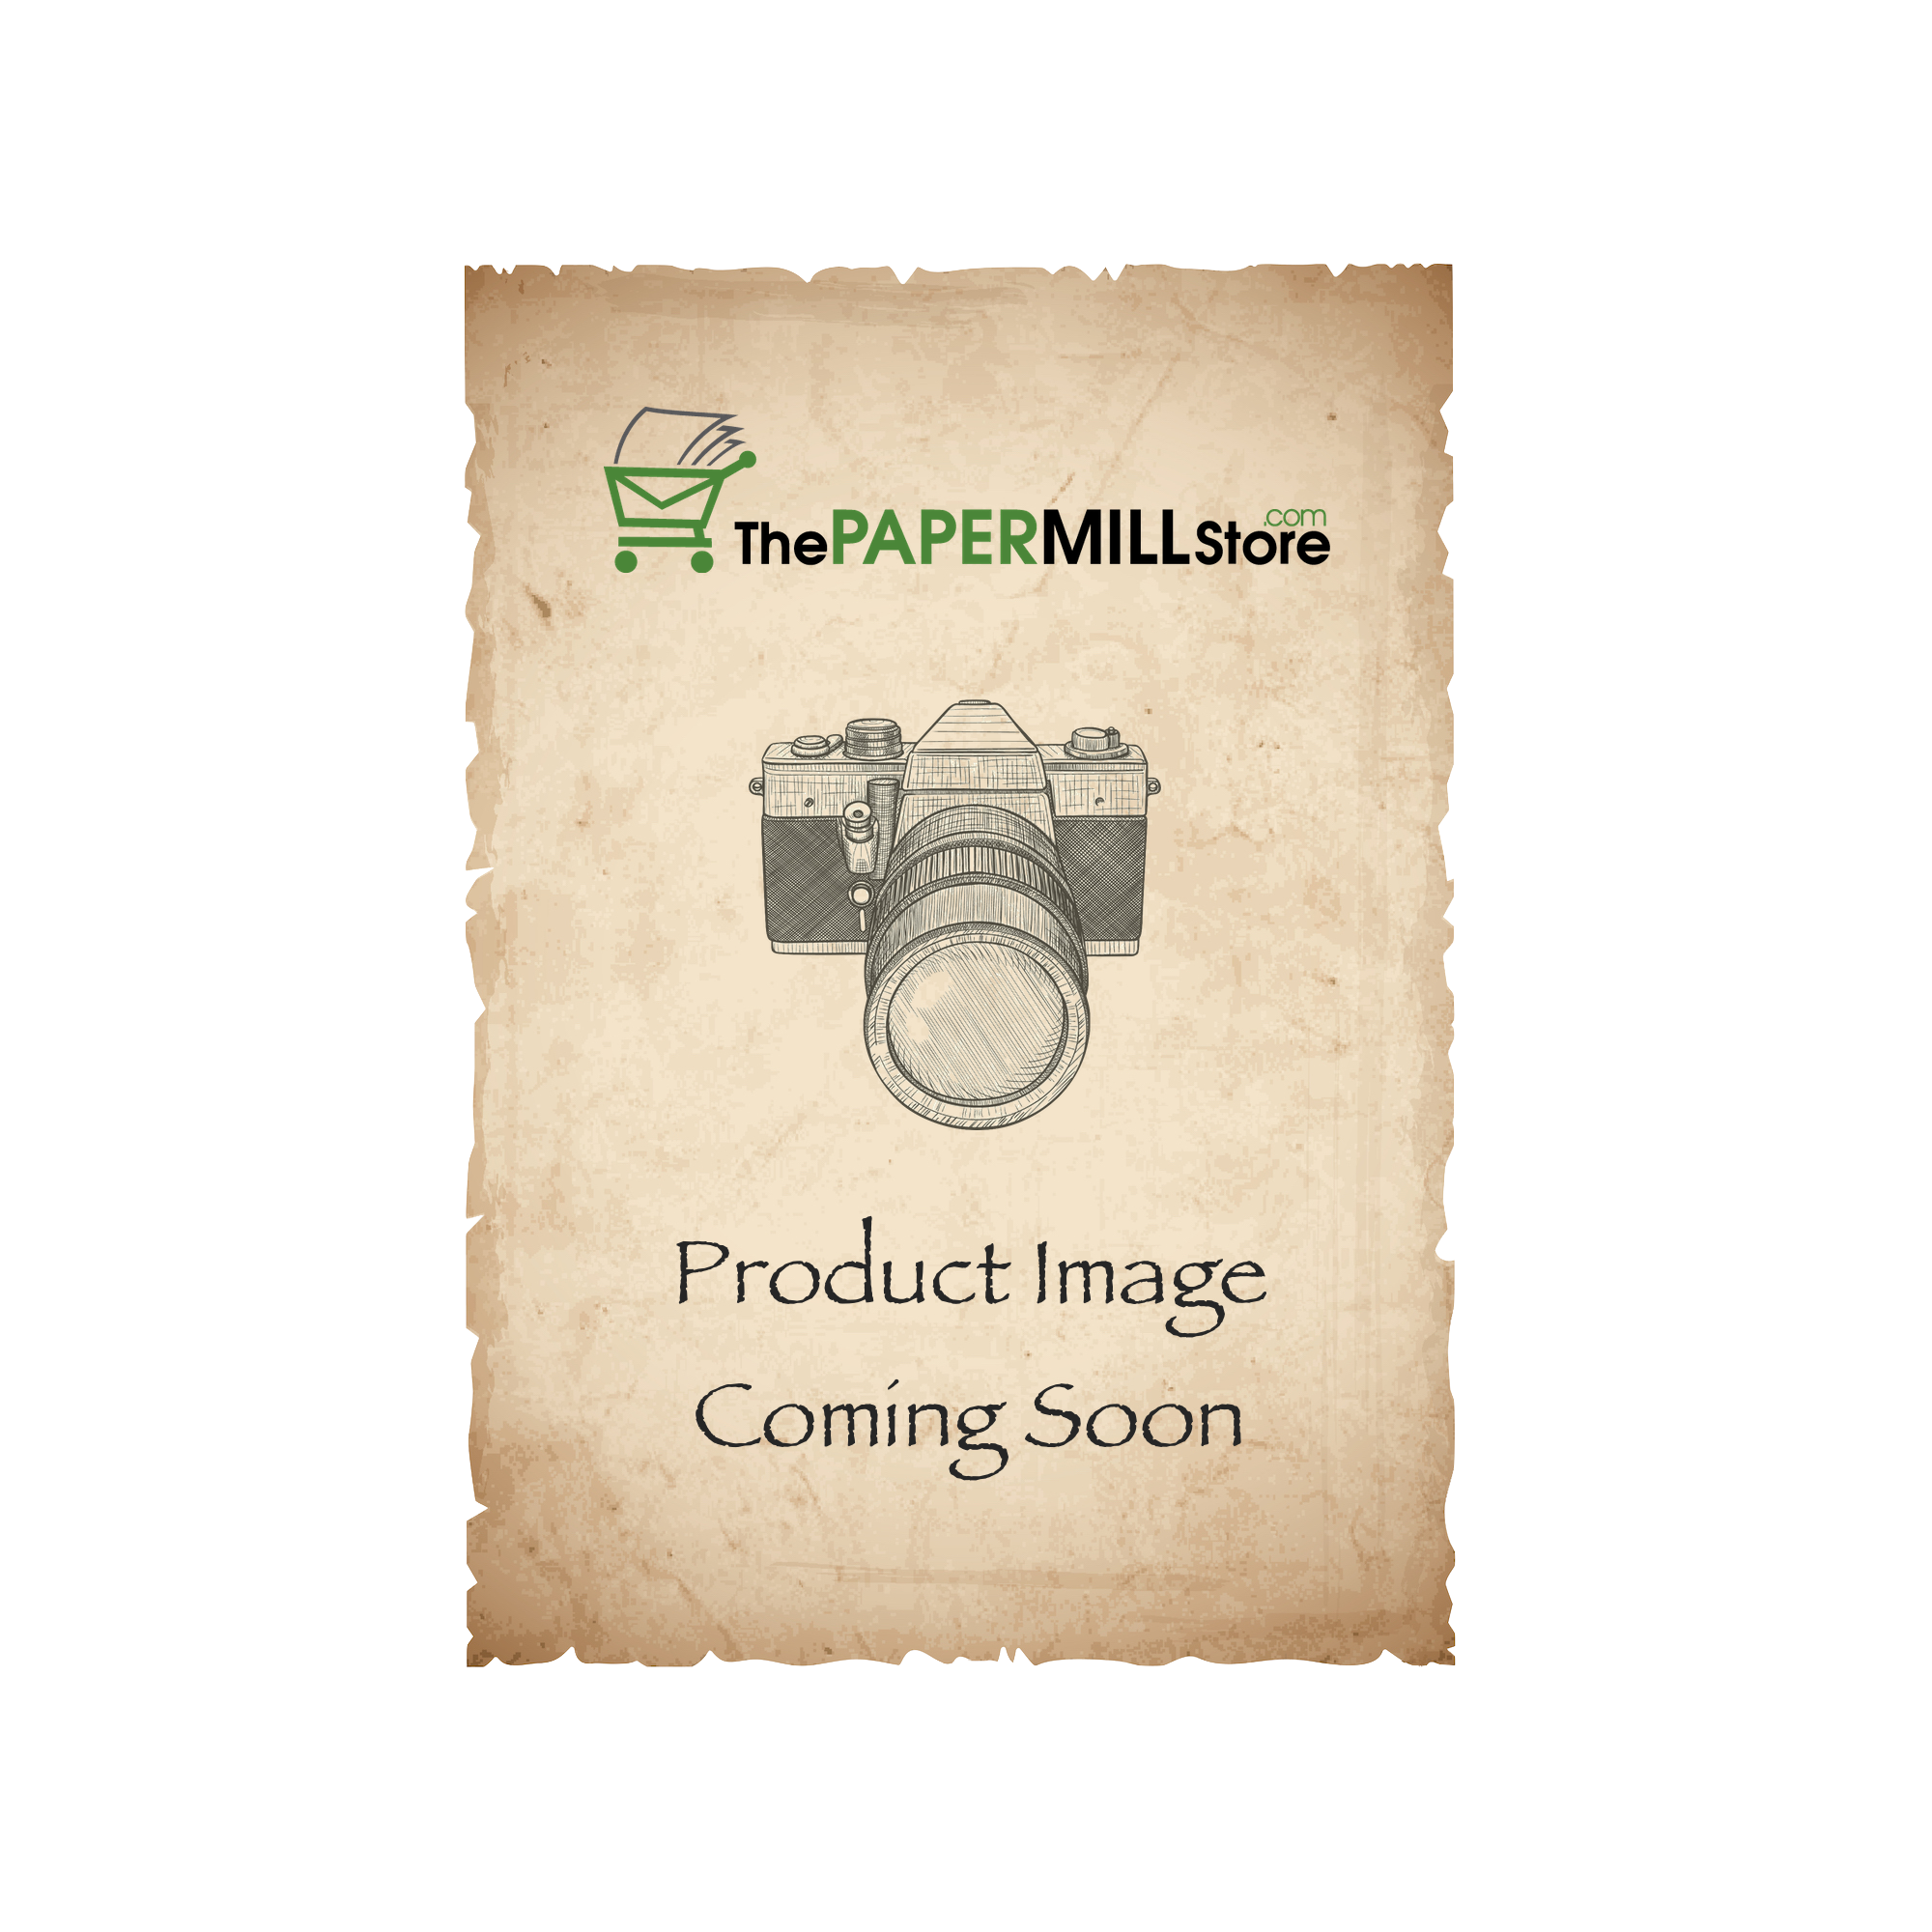 Ultrafelt Softwhite Envelopes - No. 10 Commercial (4 1/8 x 9 1/2) 80 lb Text Premium Felt  30% Recycled 500 per Box